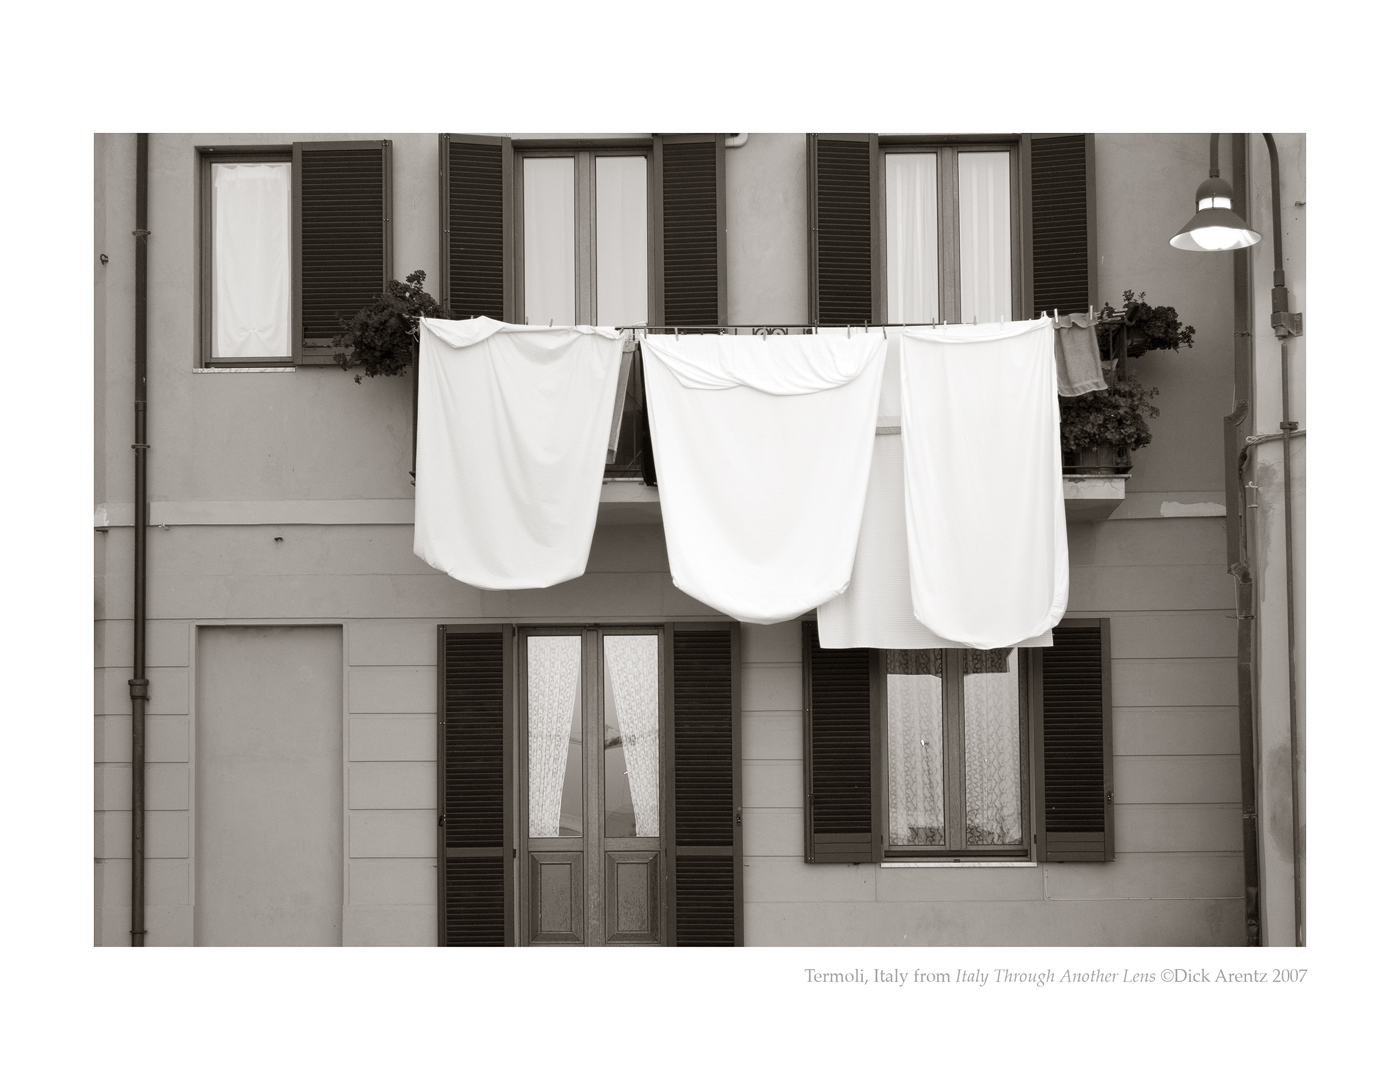 Termoli, Italy - Italy Through Another Lens